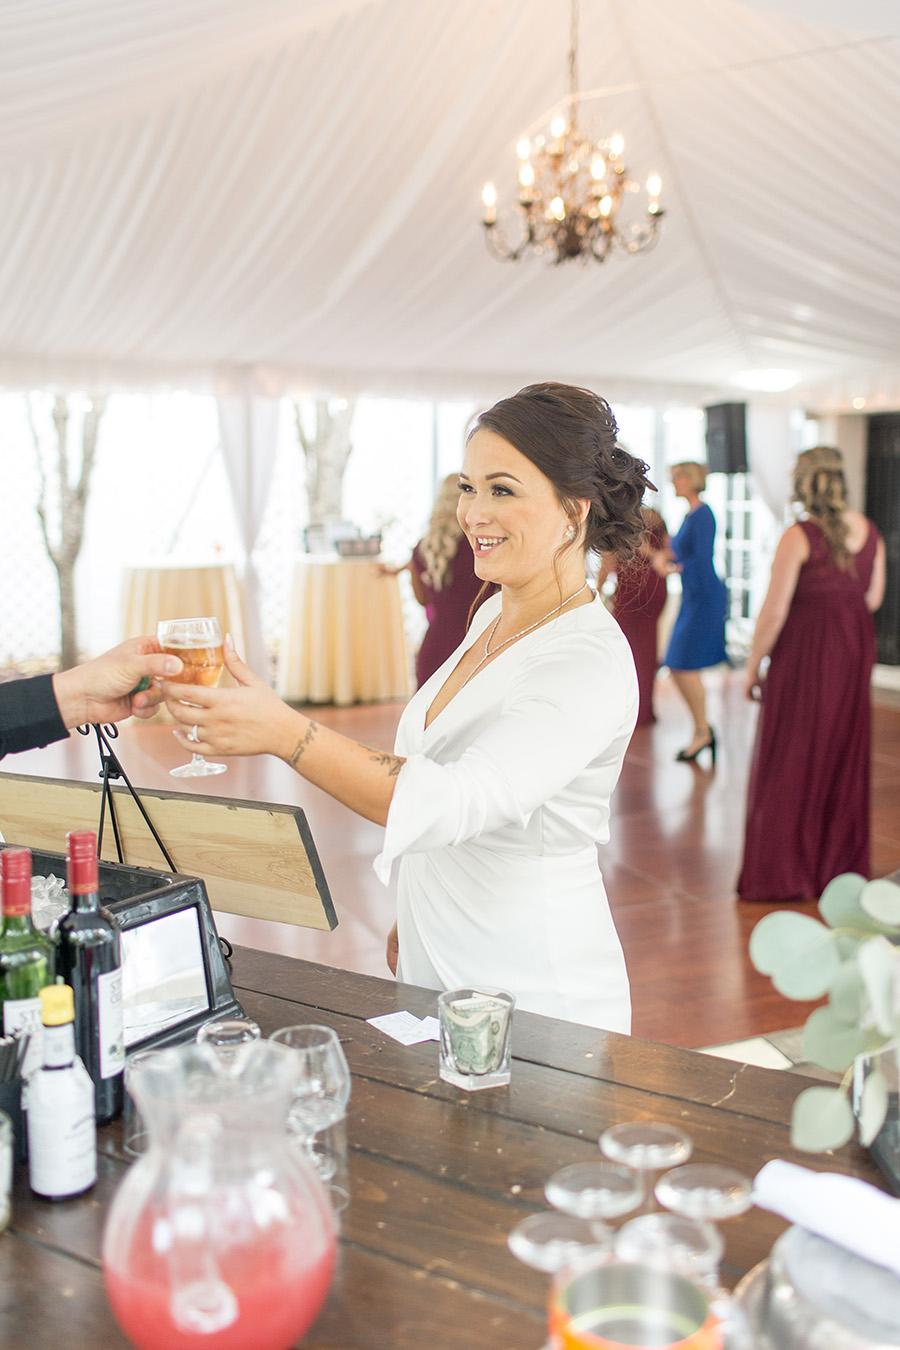 Signature drink at wedding